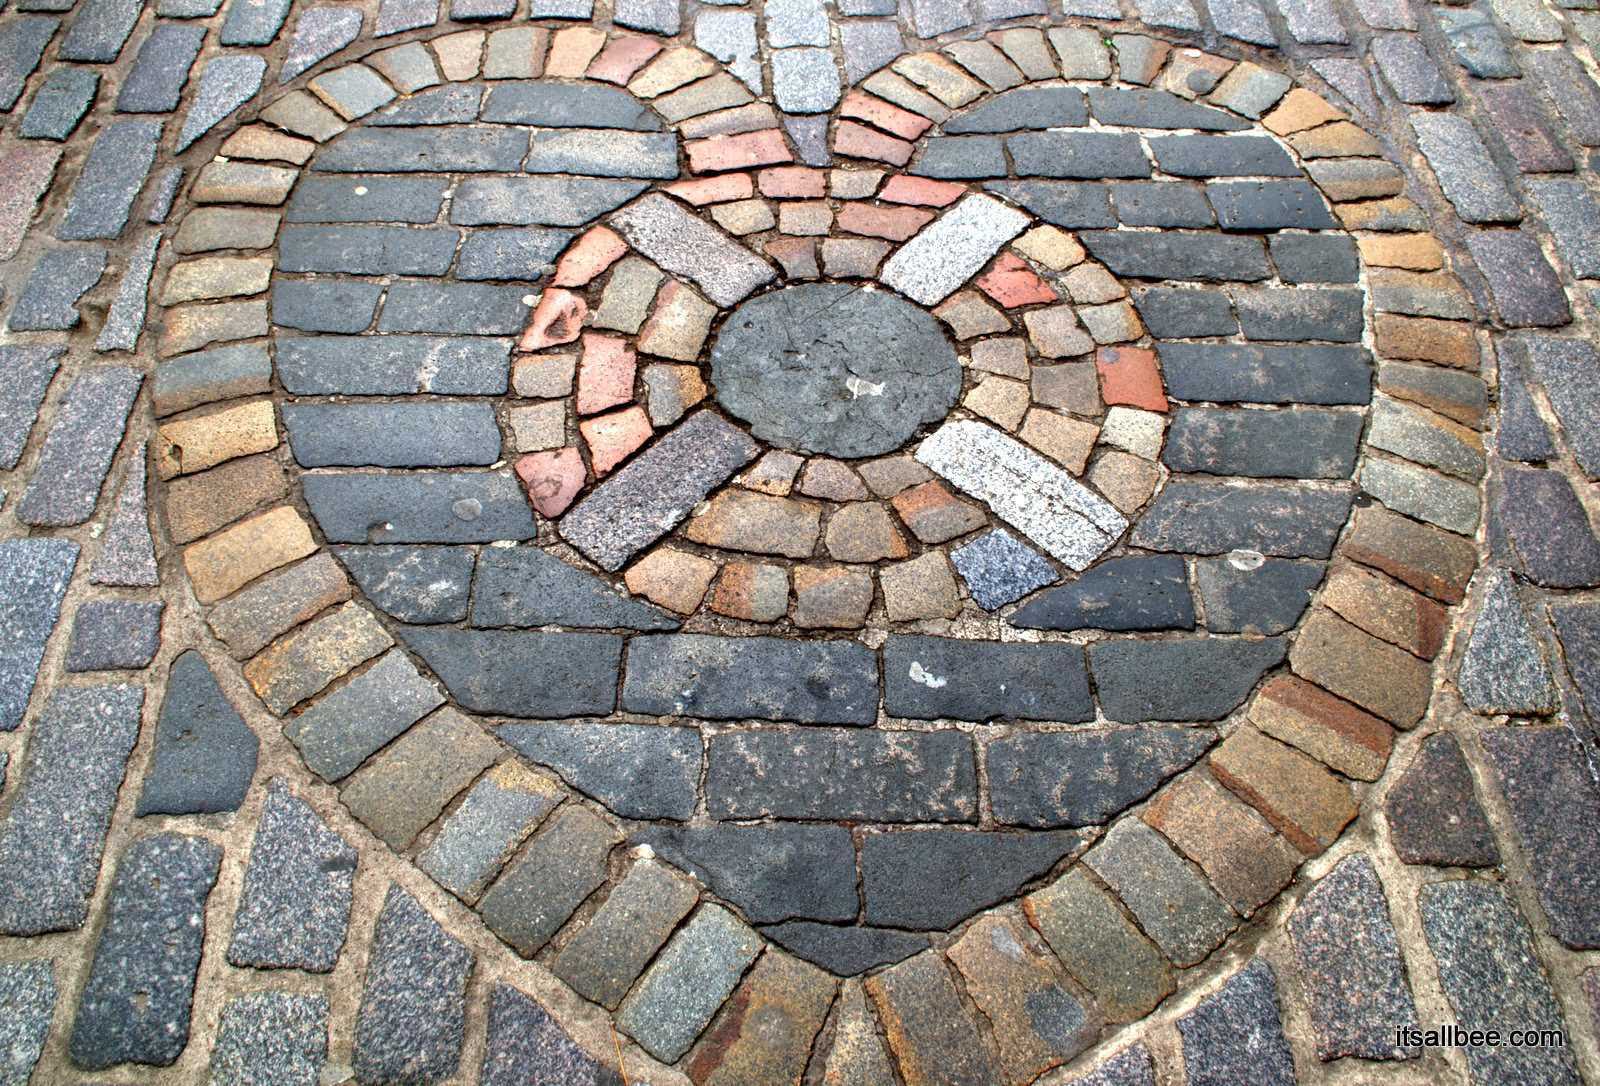 princess street gardens -Edinburgh - Midlothian Heart